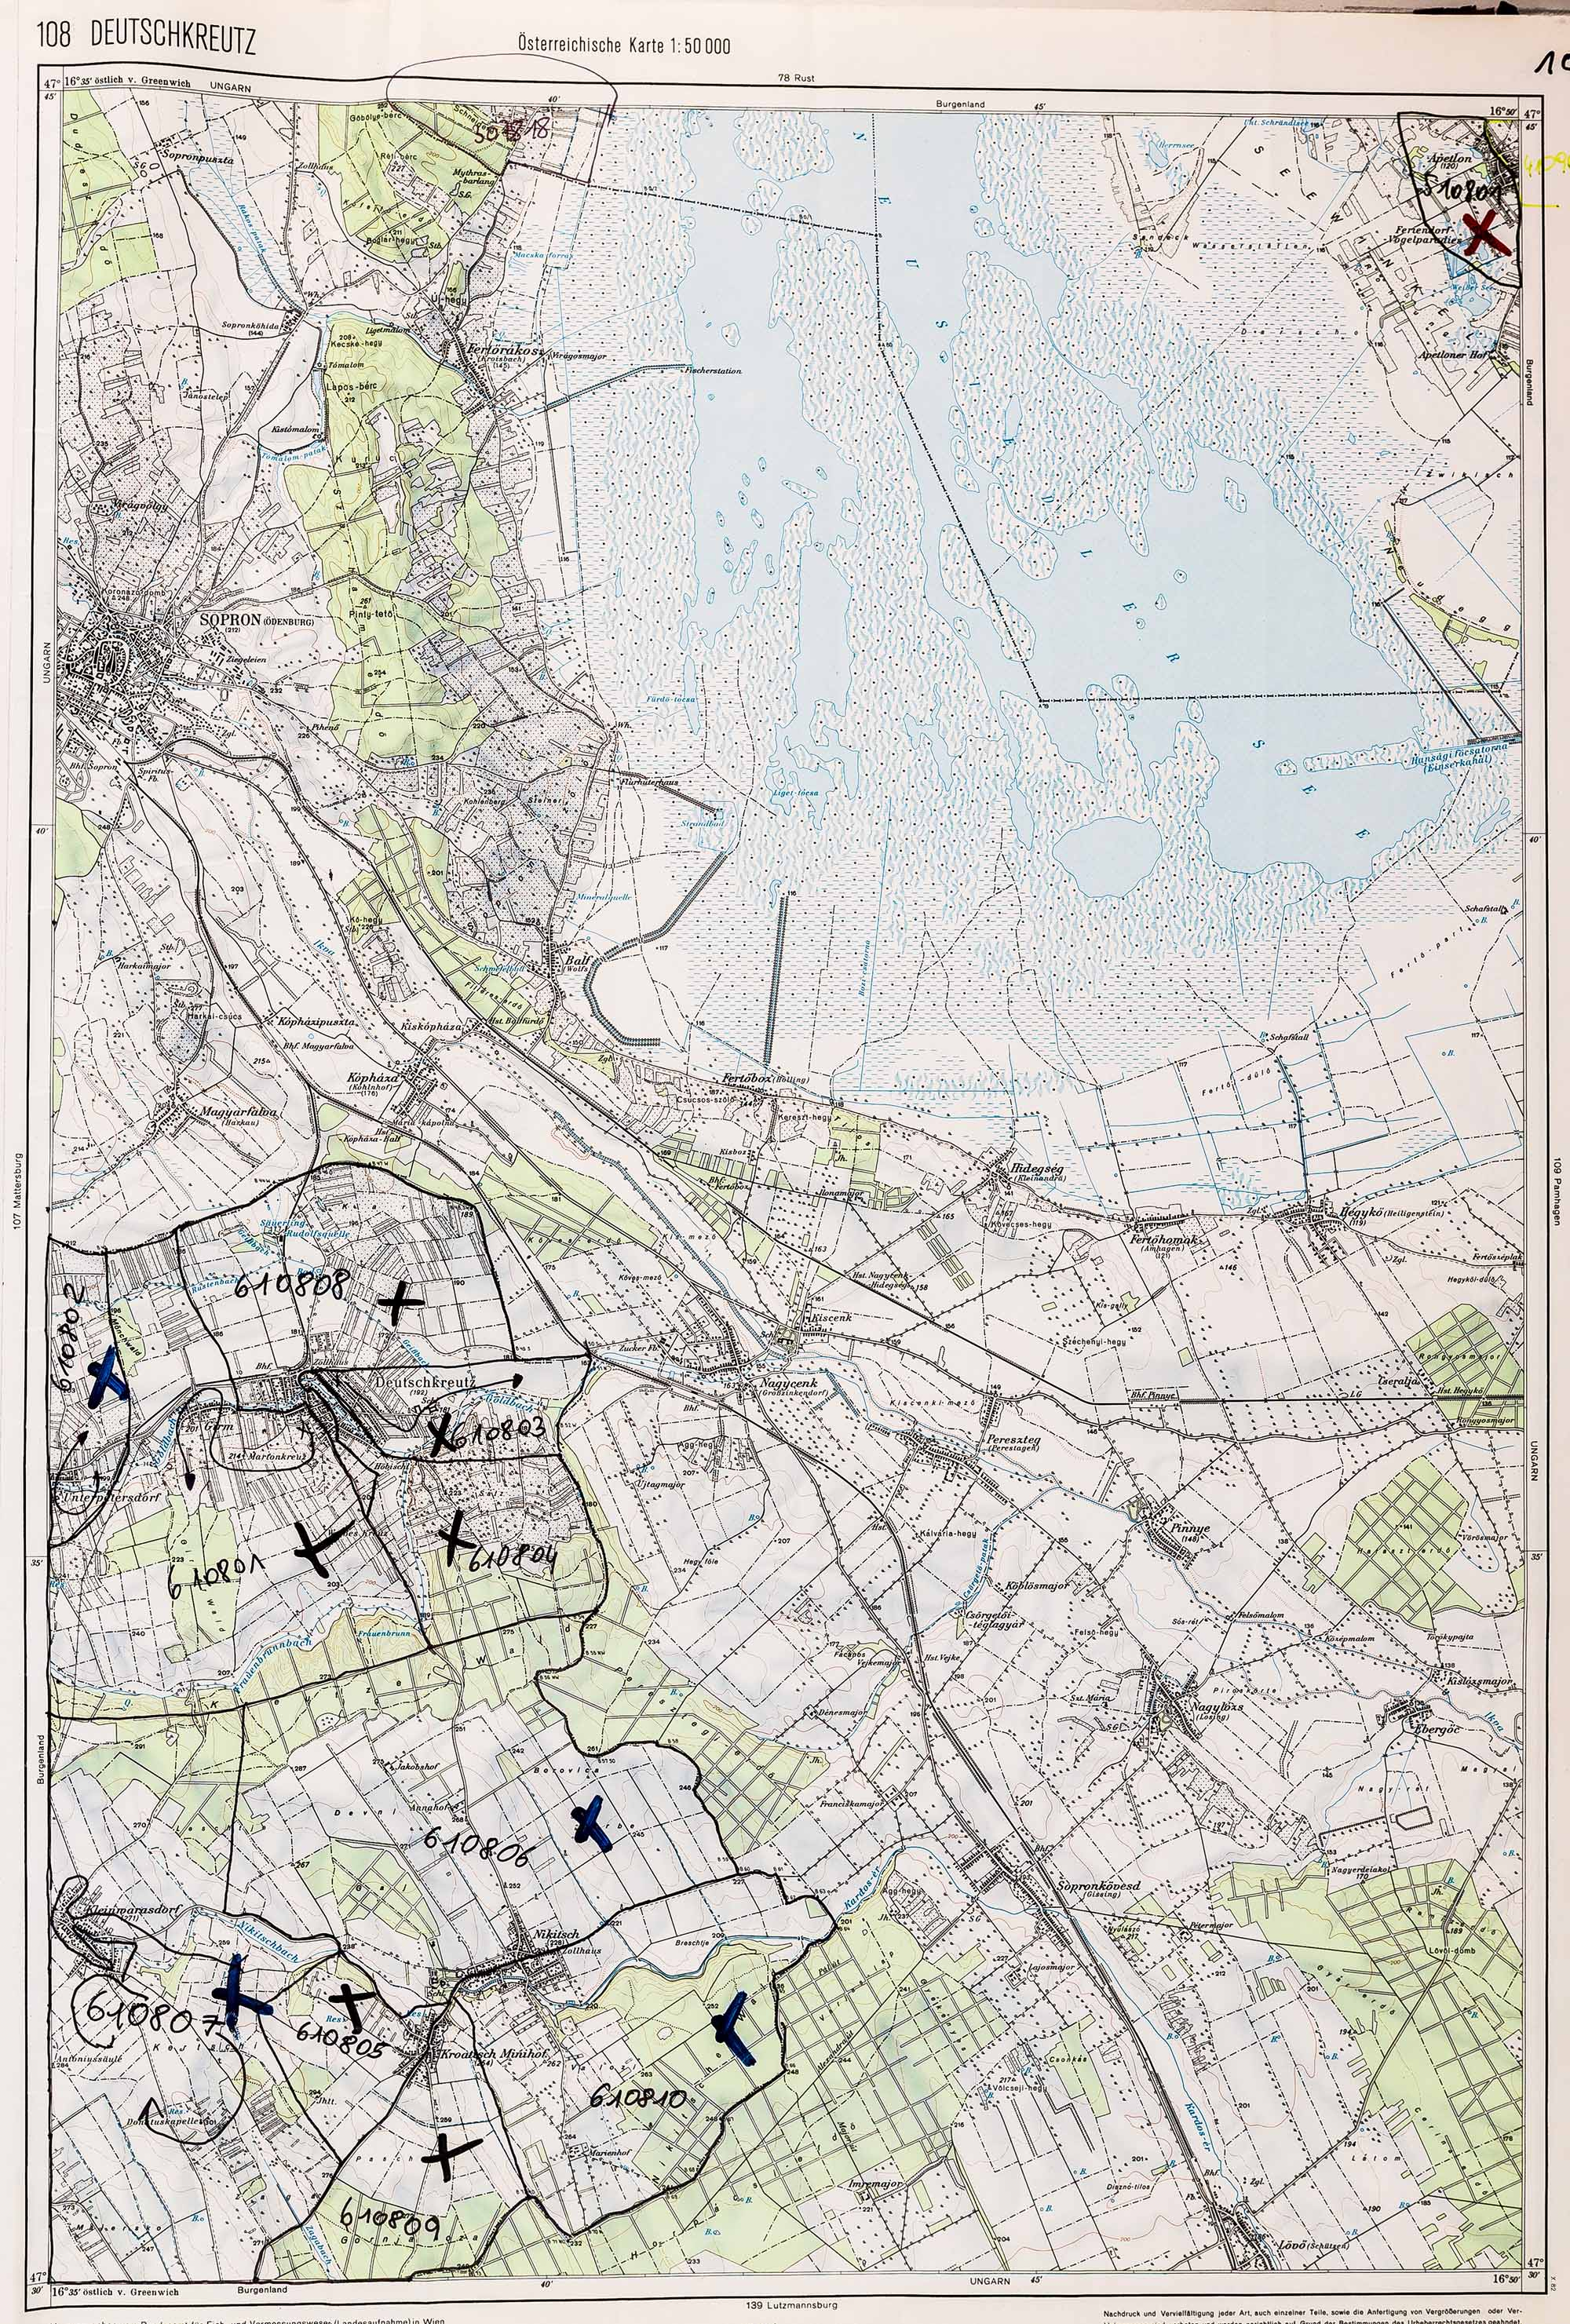 1983-1986 Karte 108